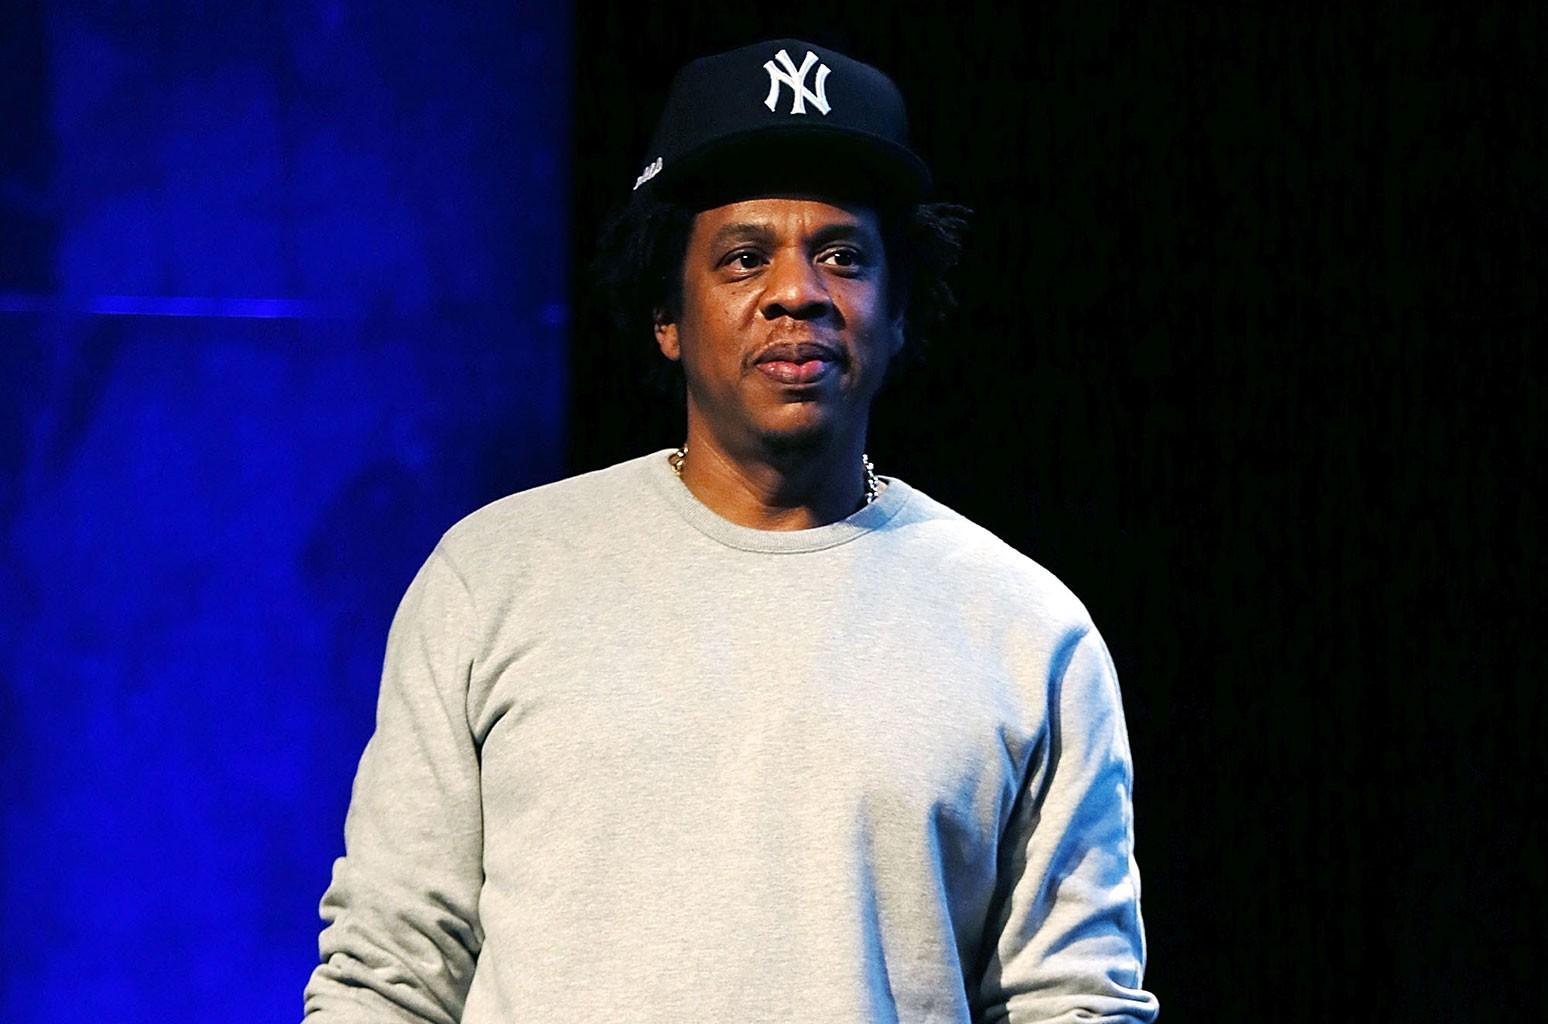 Shawn 'Jay-Z' Carter